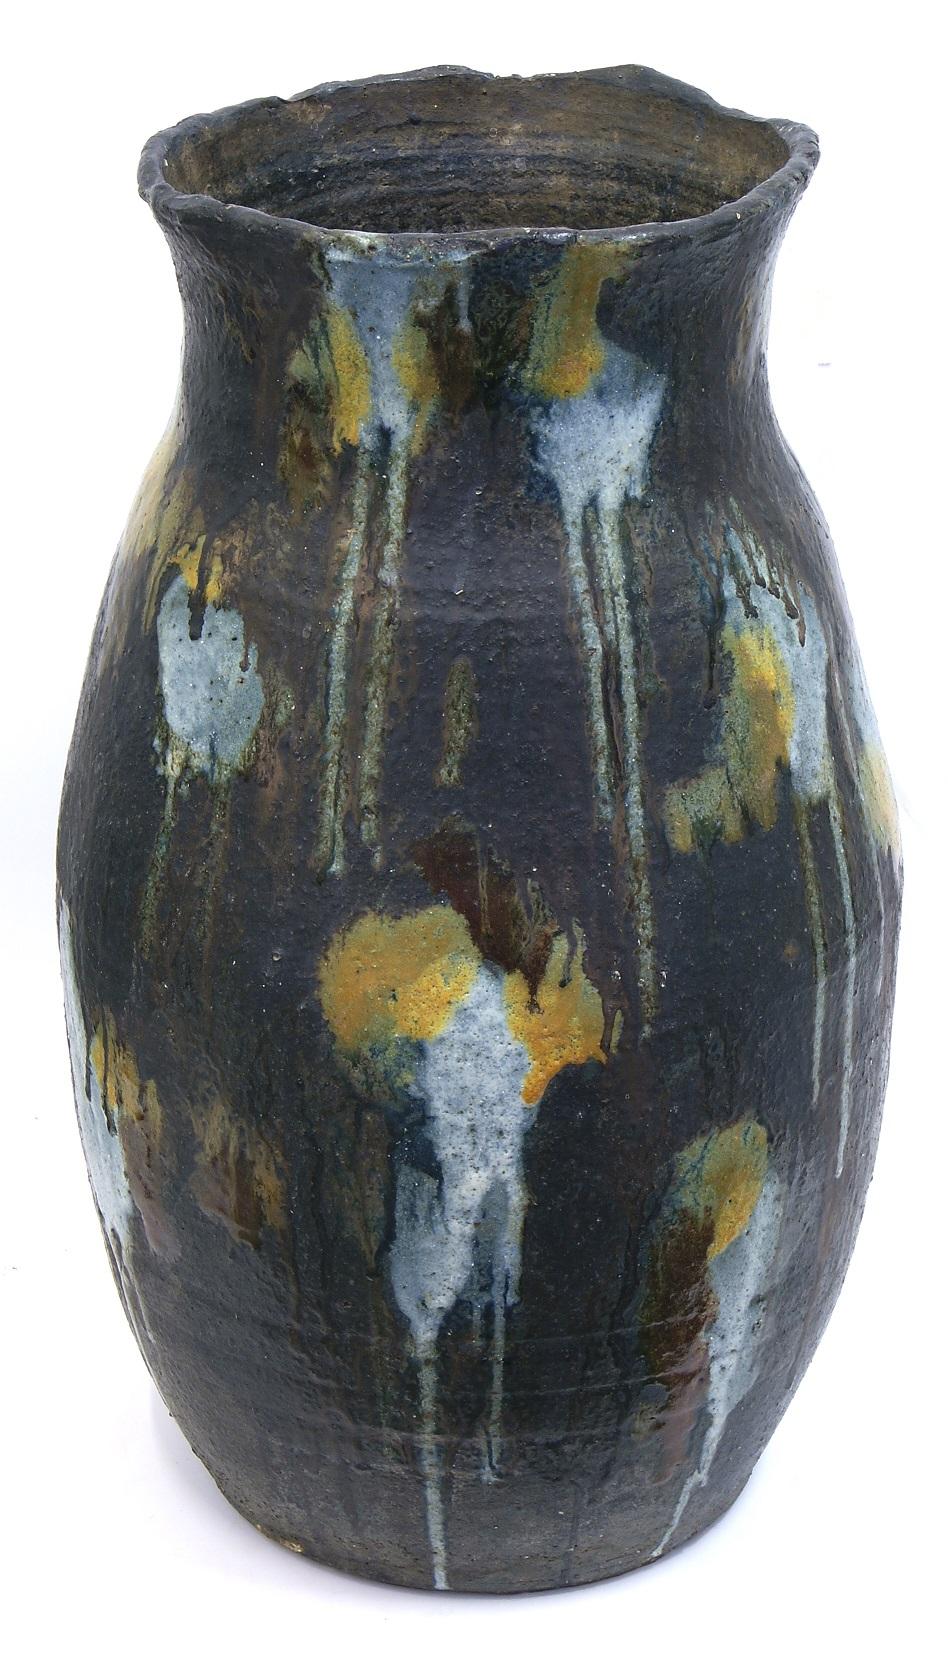 Milton Moon, Big Jar, stoneware, h65cm, 1991. Photo courtesy of Aptos Cruz Galleries.jpeg